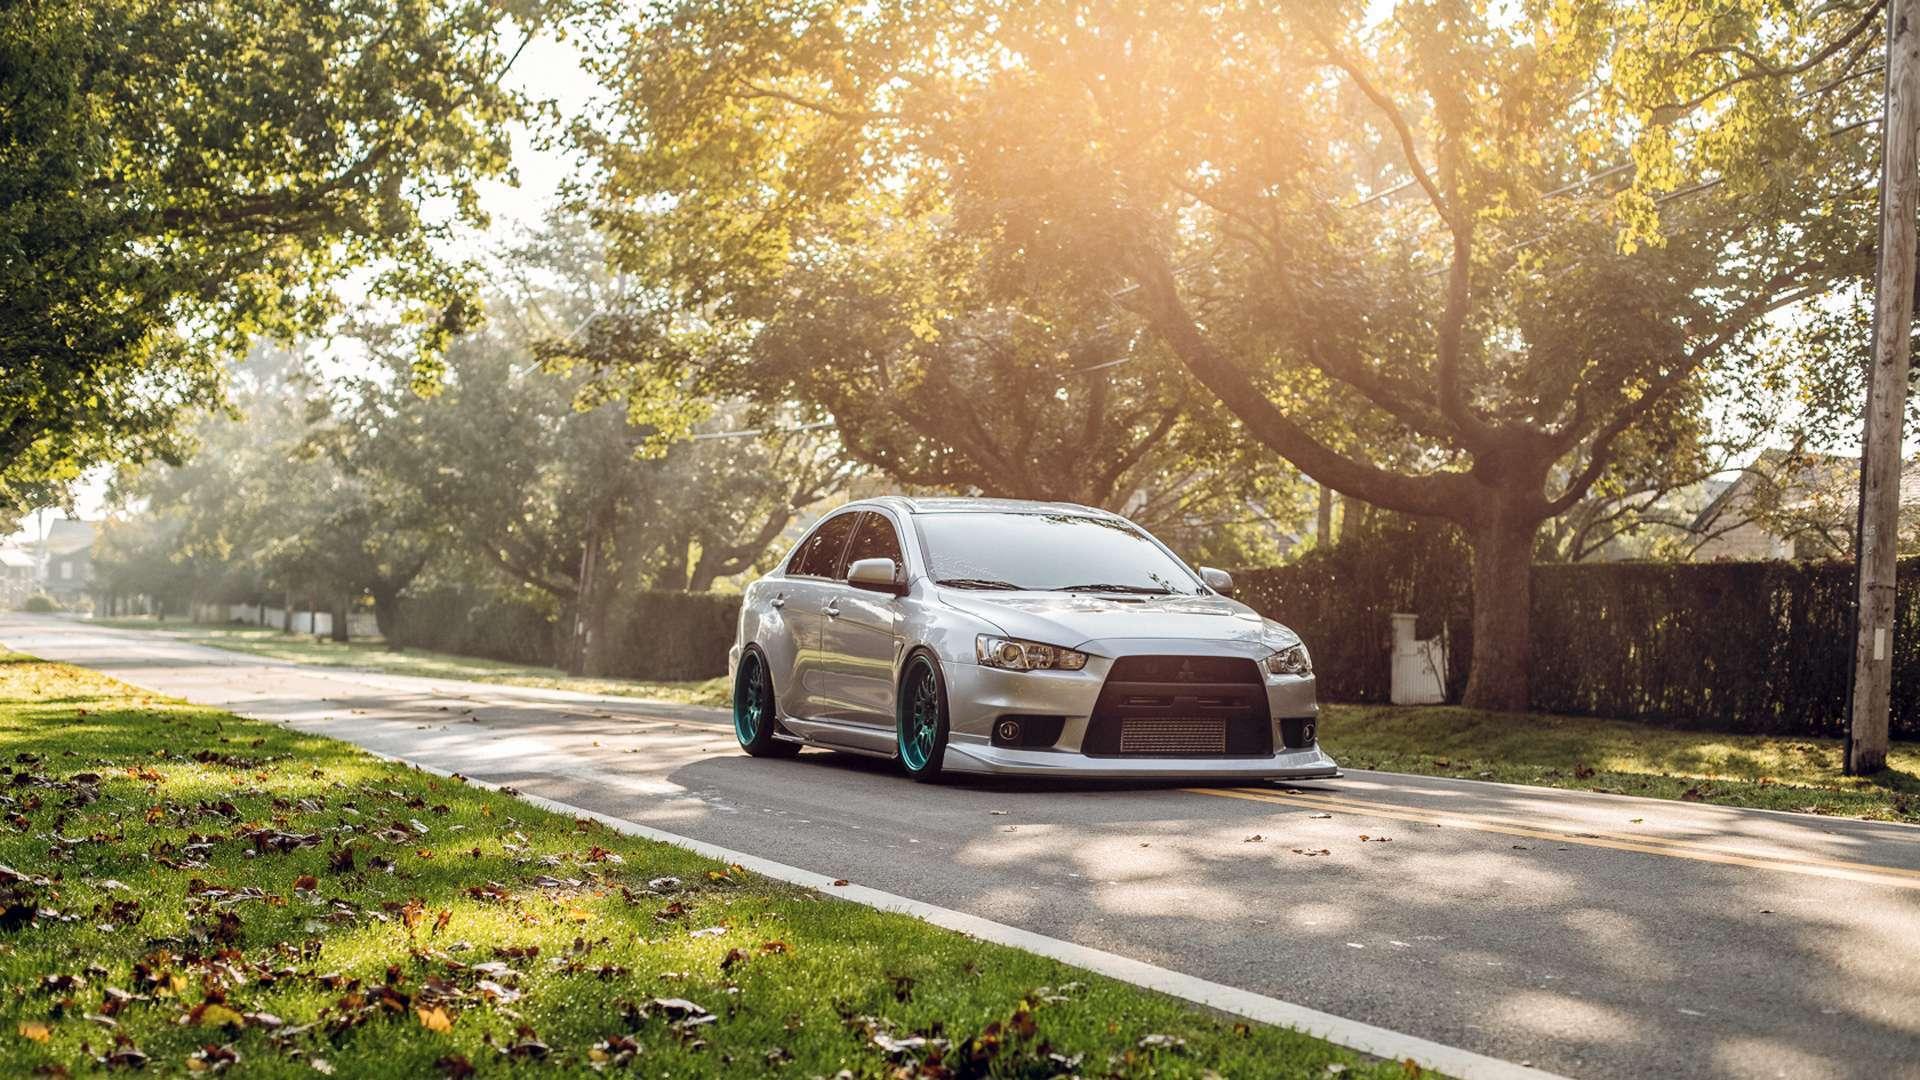 Free Download View Of Mitsubishi Lancer Evo Hd Hd Wallpapers